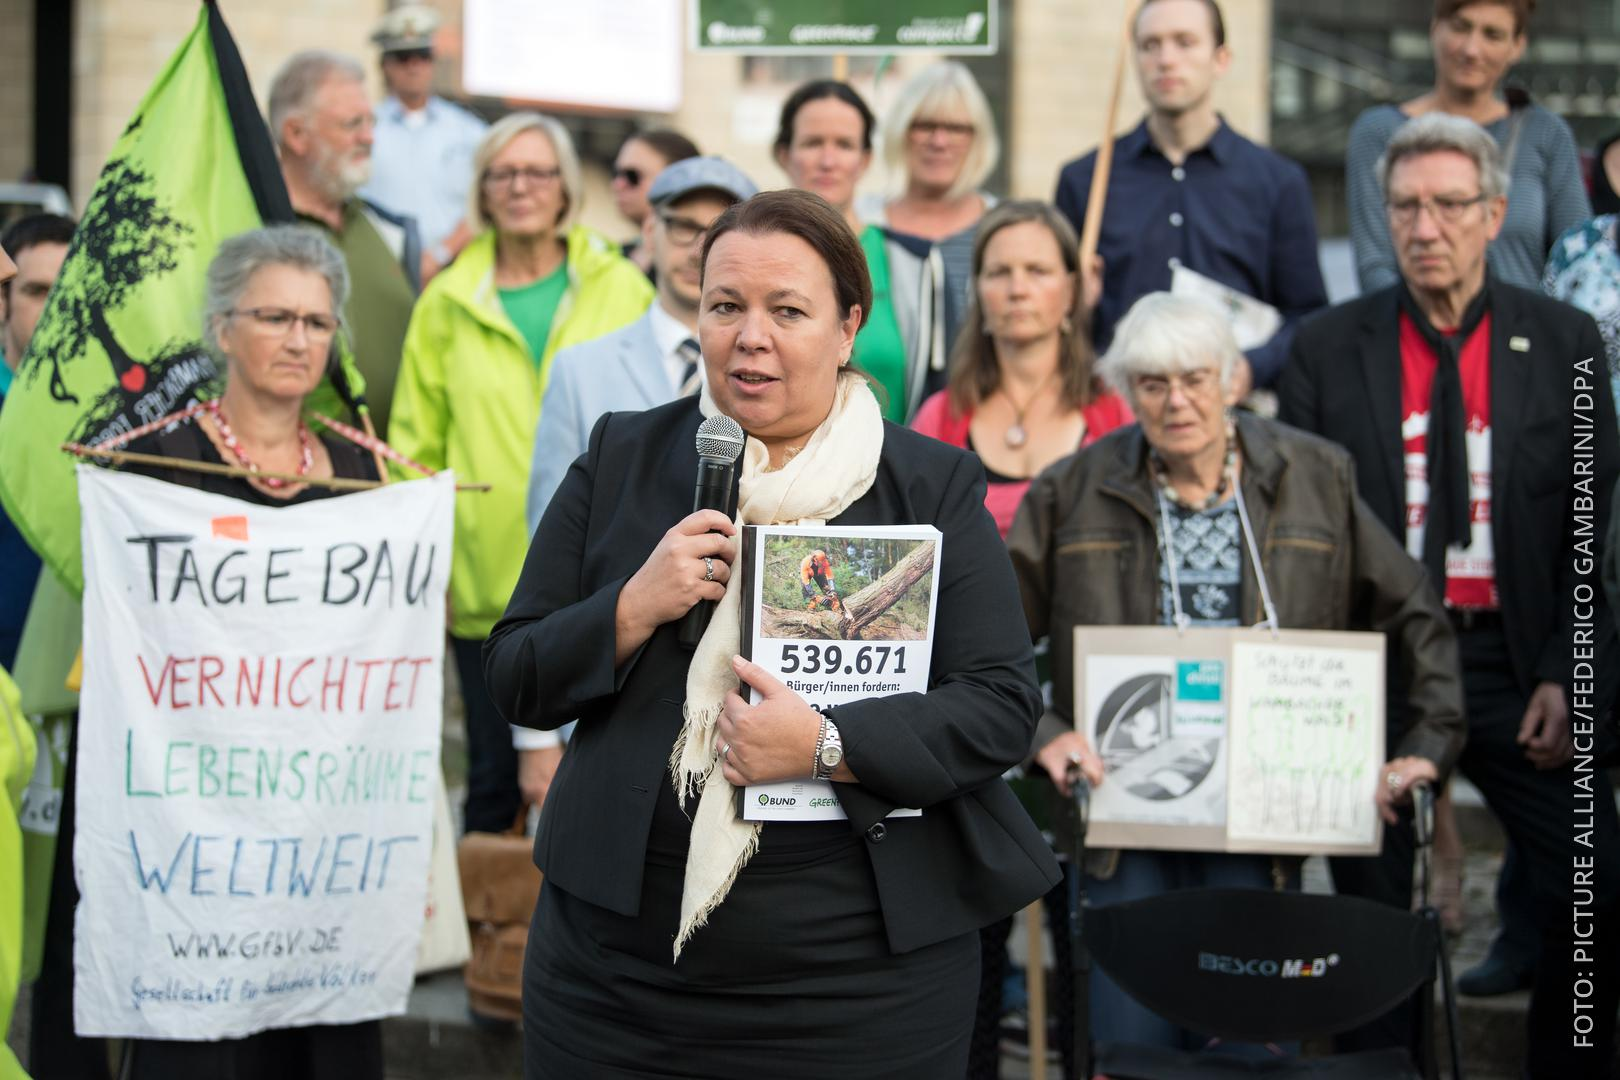 NRW-Umweltministerin nimmt Unterschriftenliste entgegen